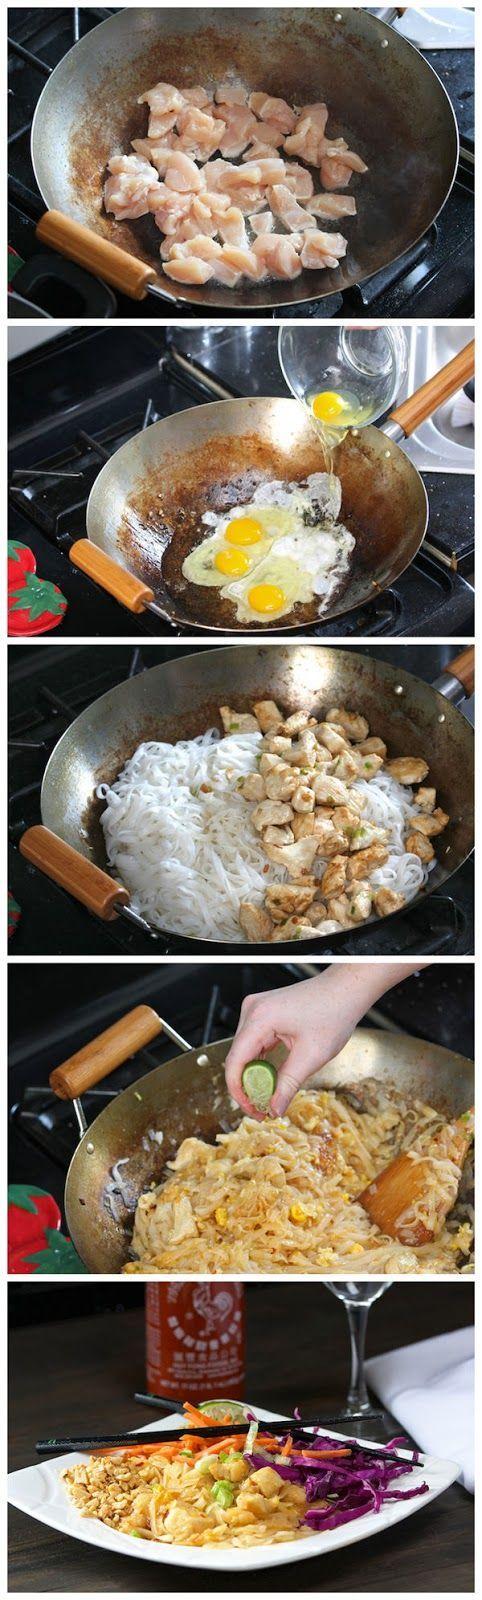 Red Star Recipe: Chicken Pad Thai